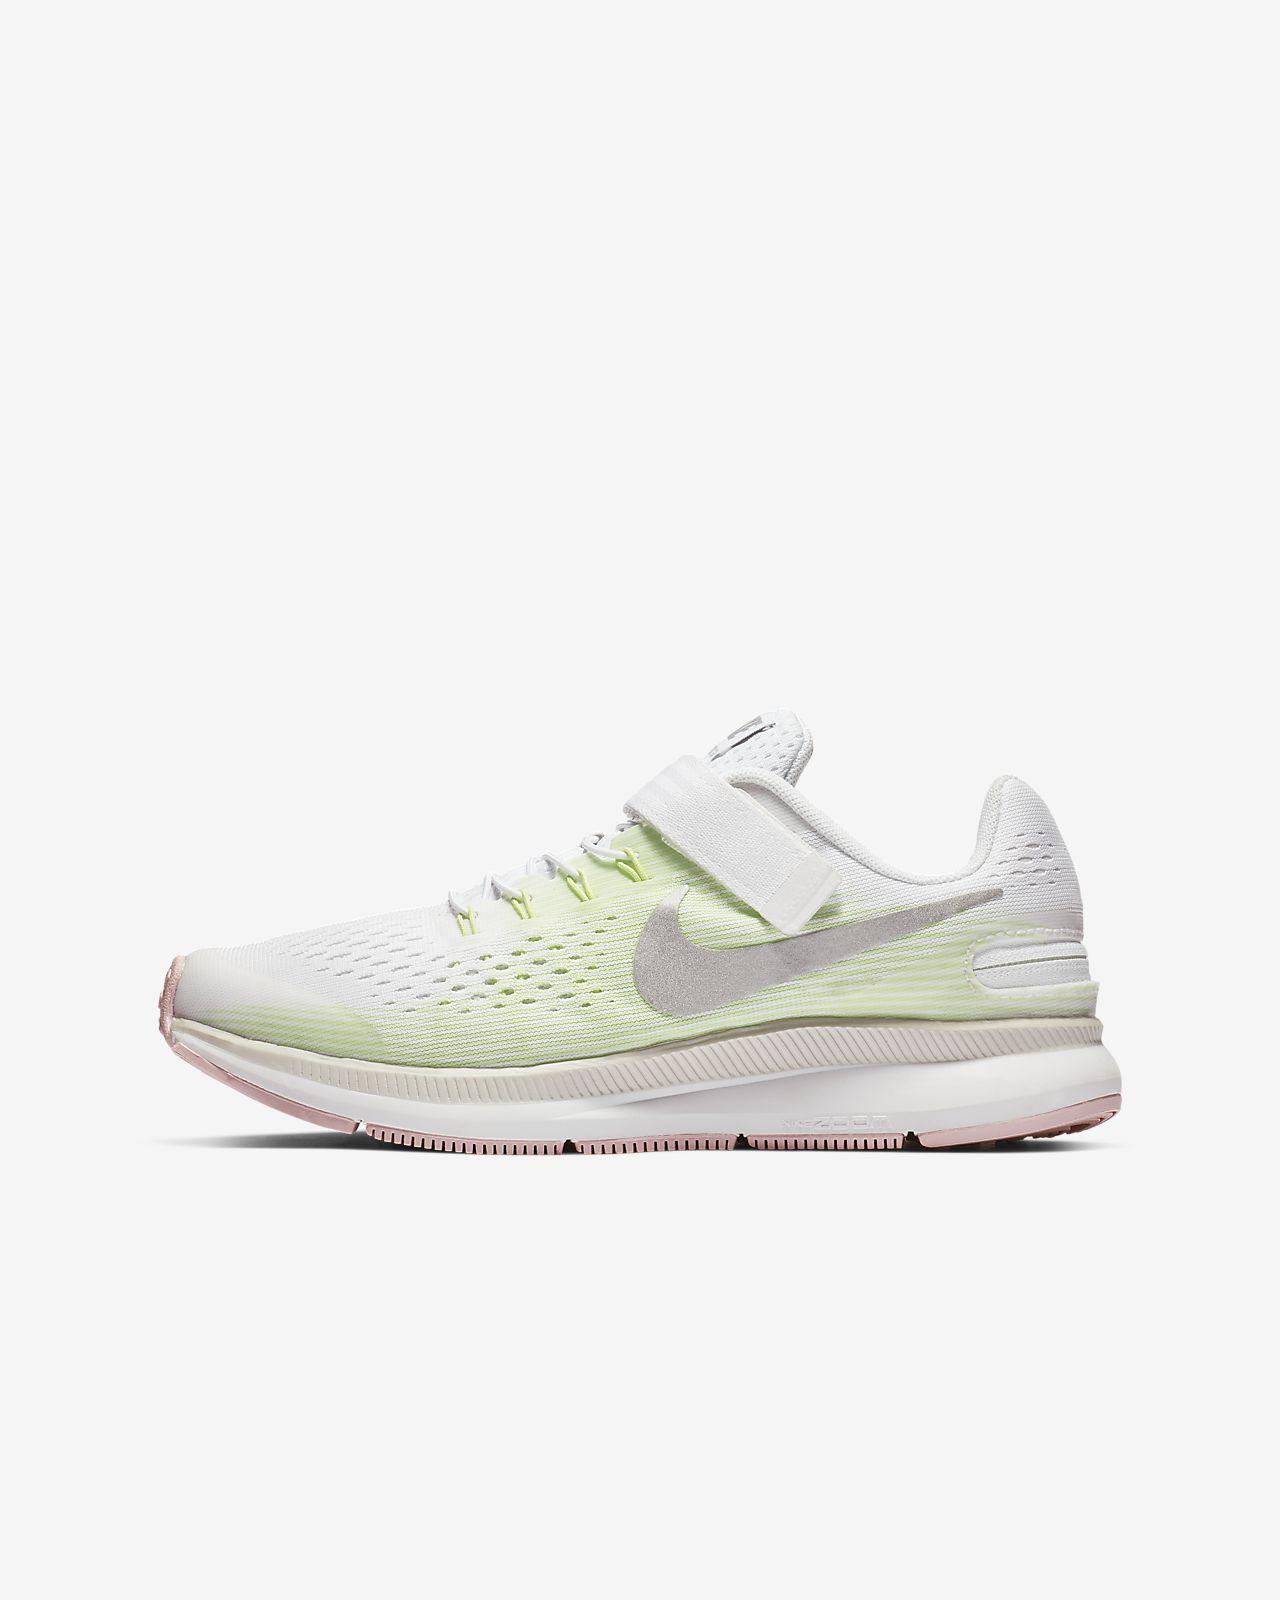 Nike Zoom Pegasus 34 FlyEase Hardloopschoen voor kleuters/kids